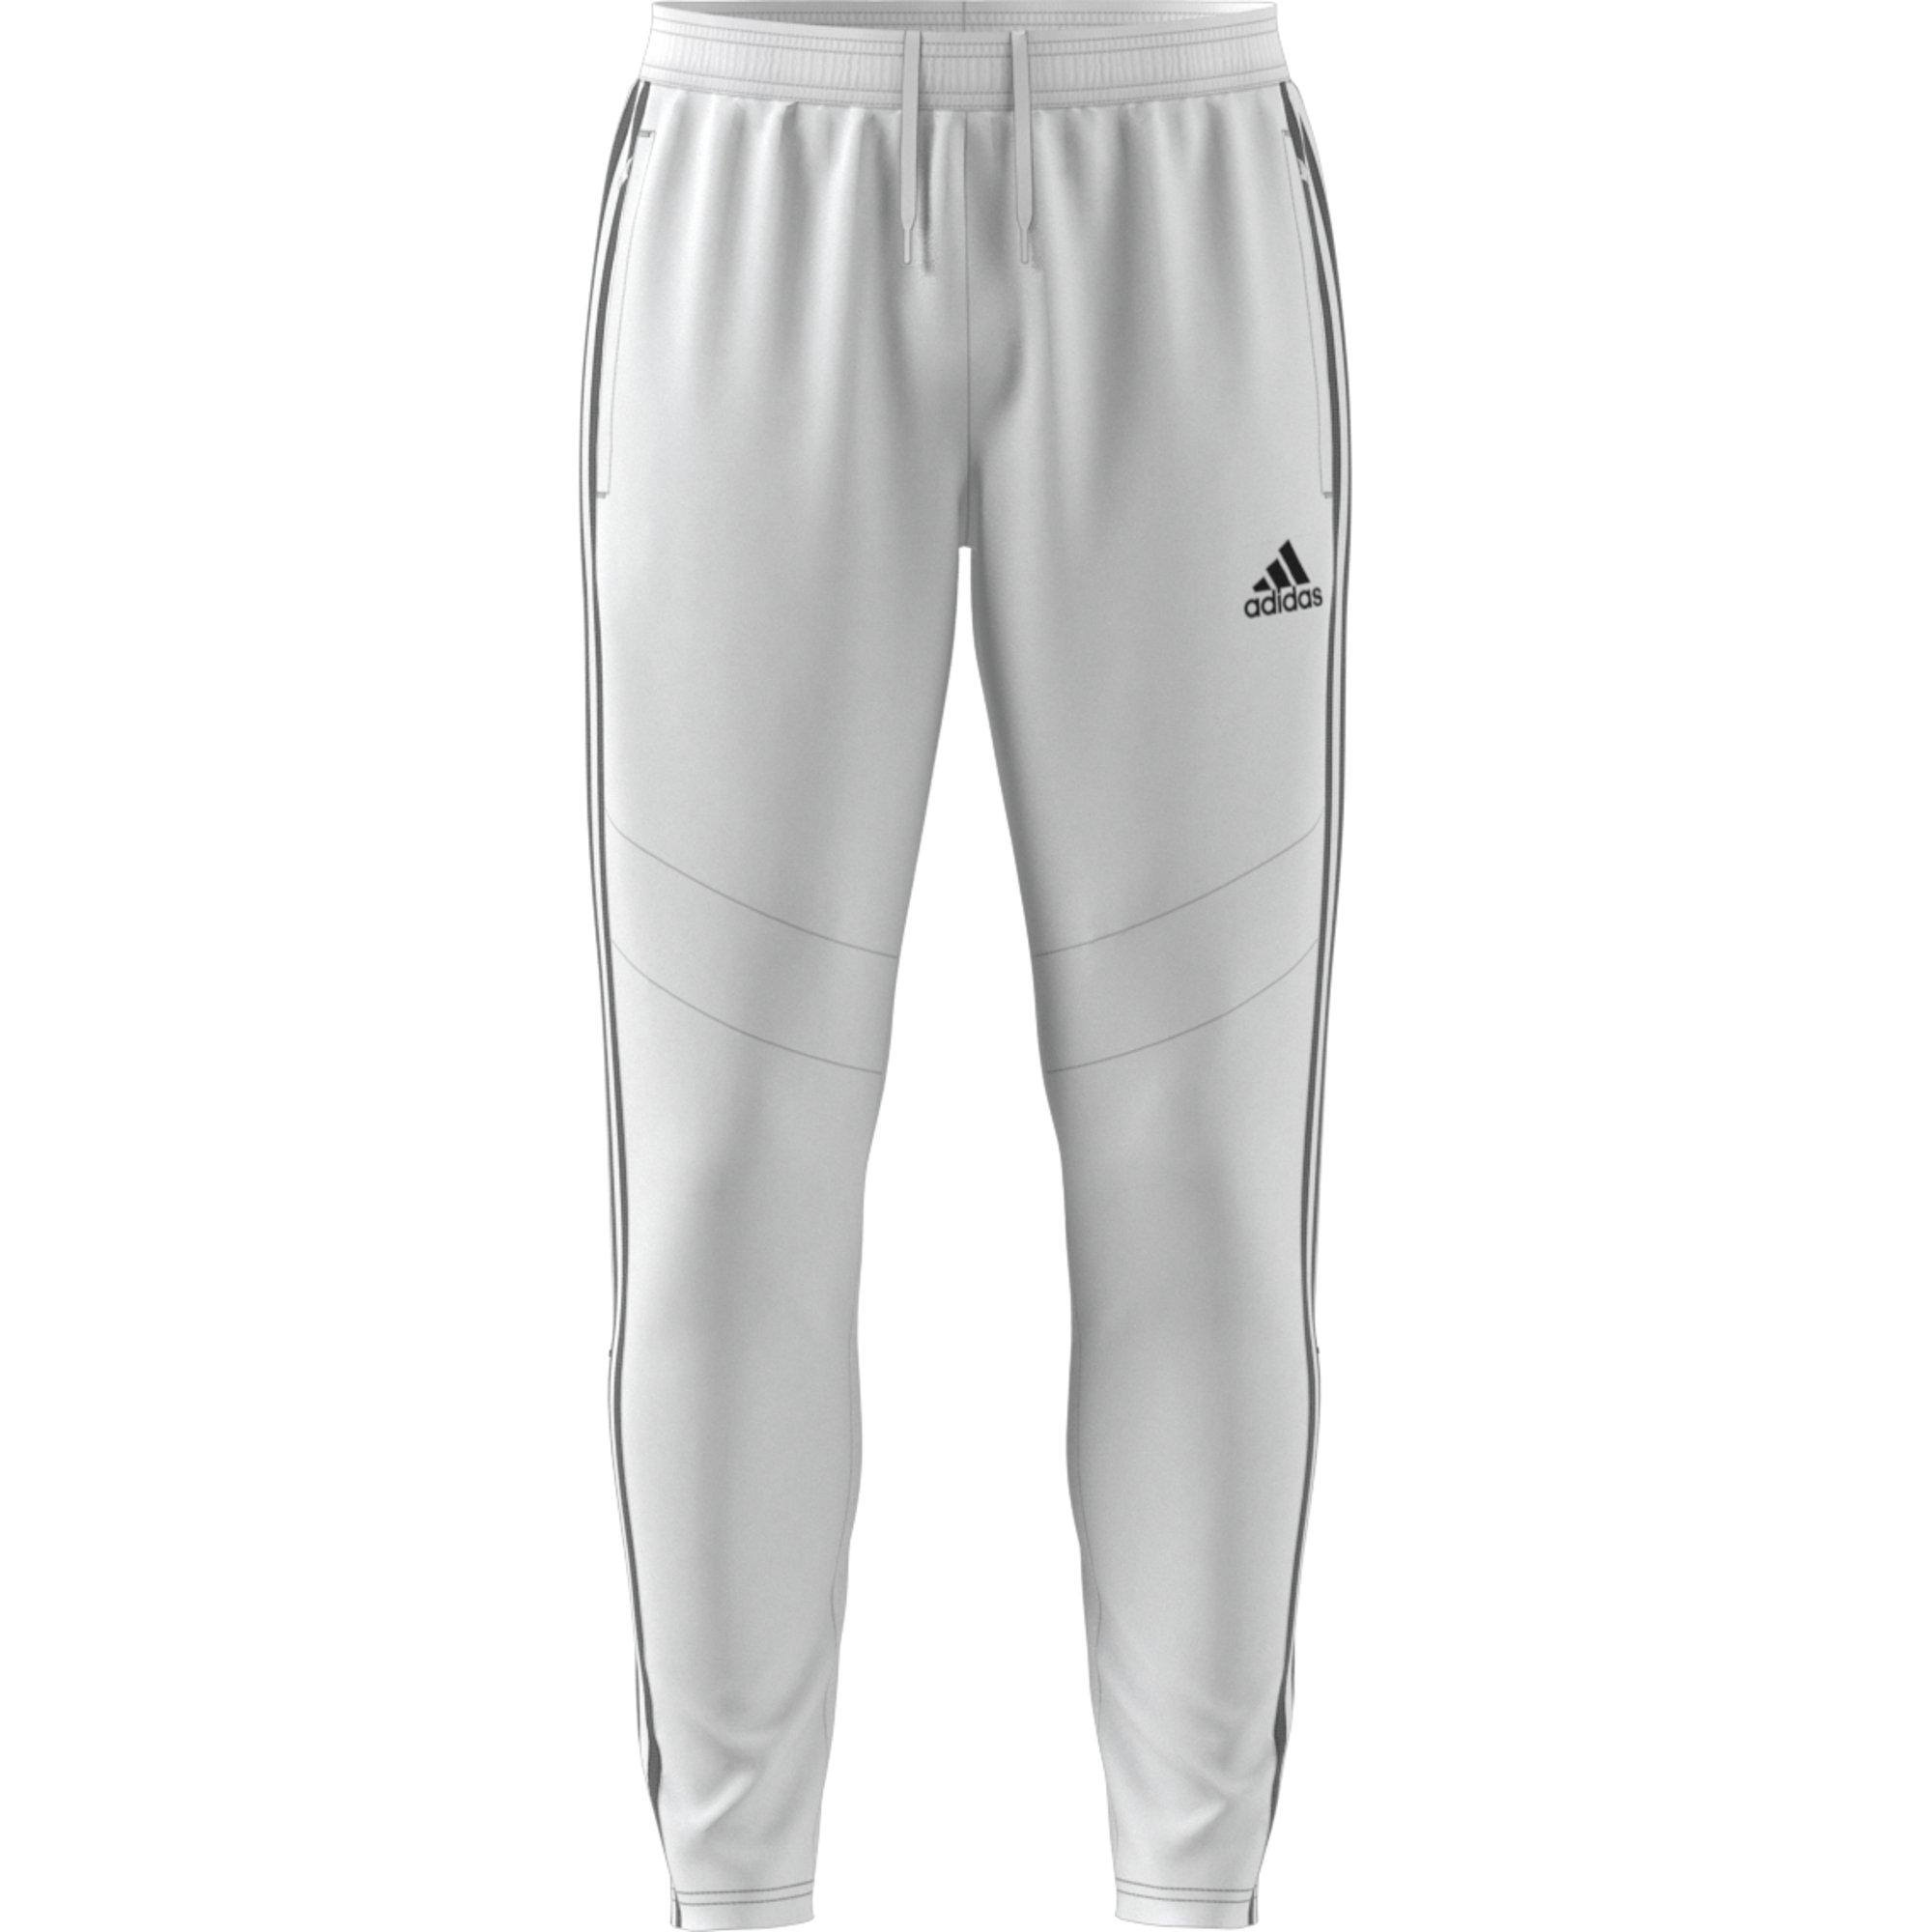 Pantaloni allenamento da Adidas per Tiro uomo 19MBianconero kuOTPiwXZ